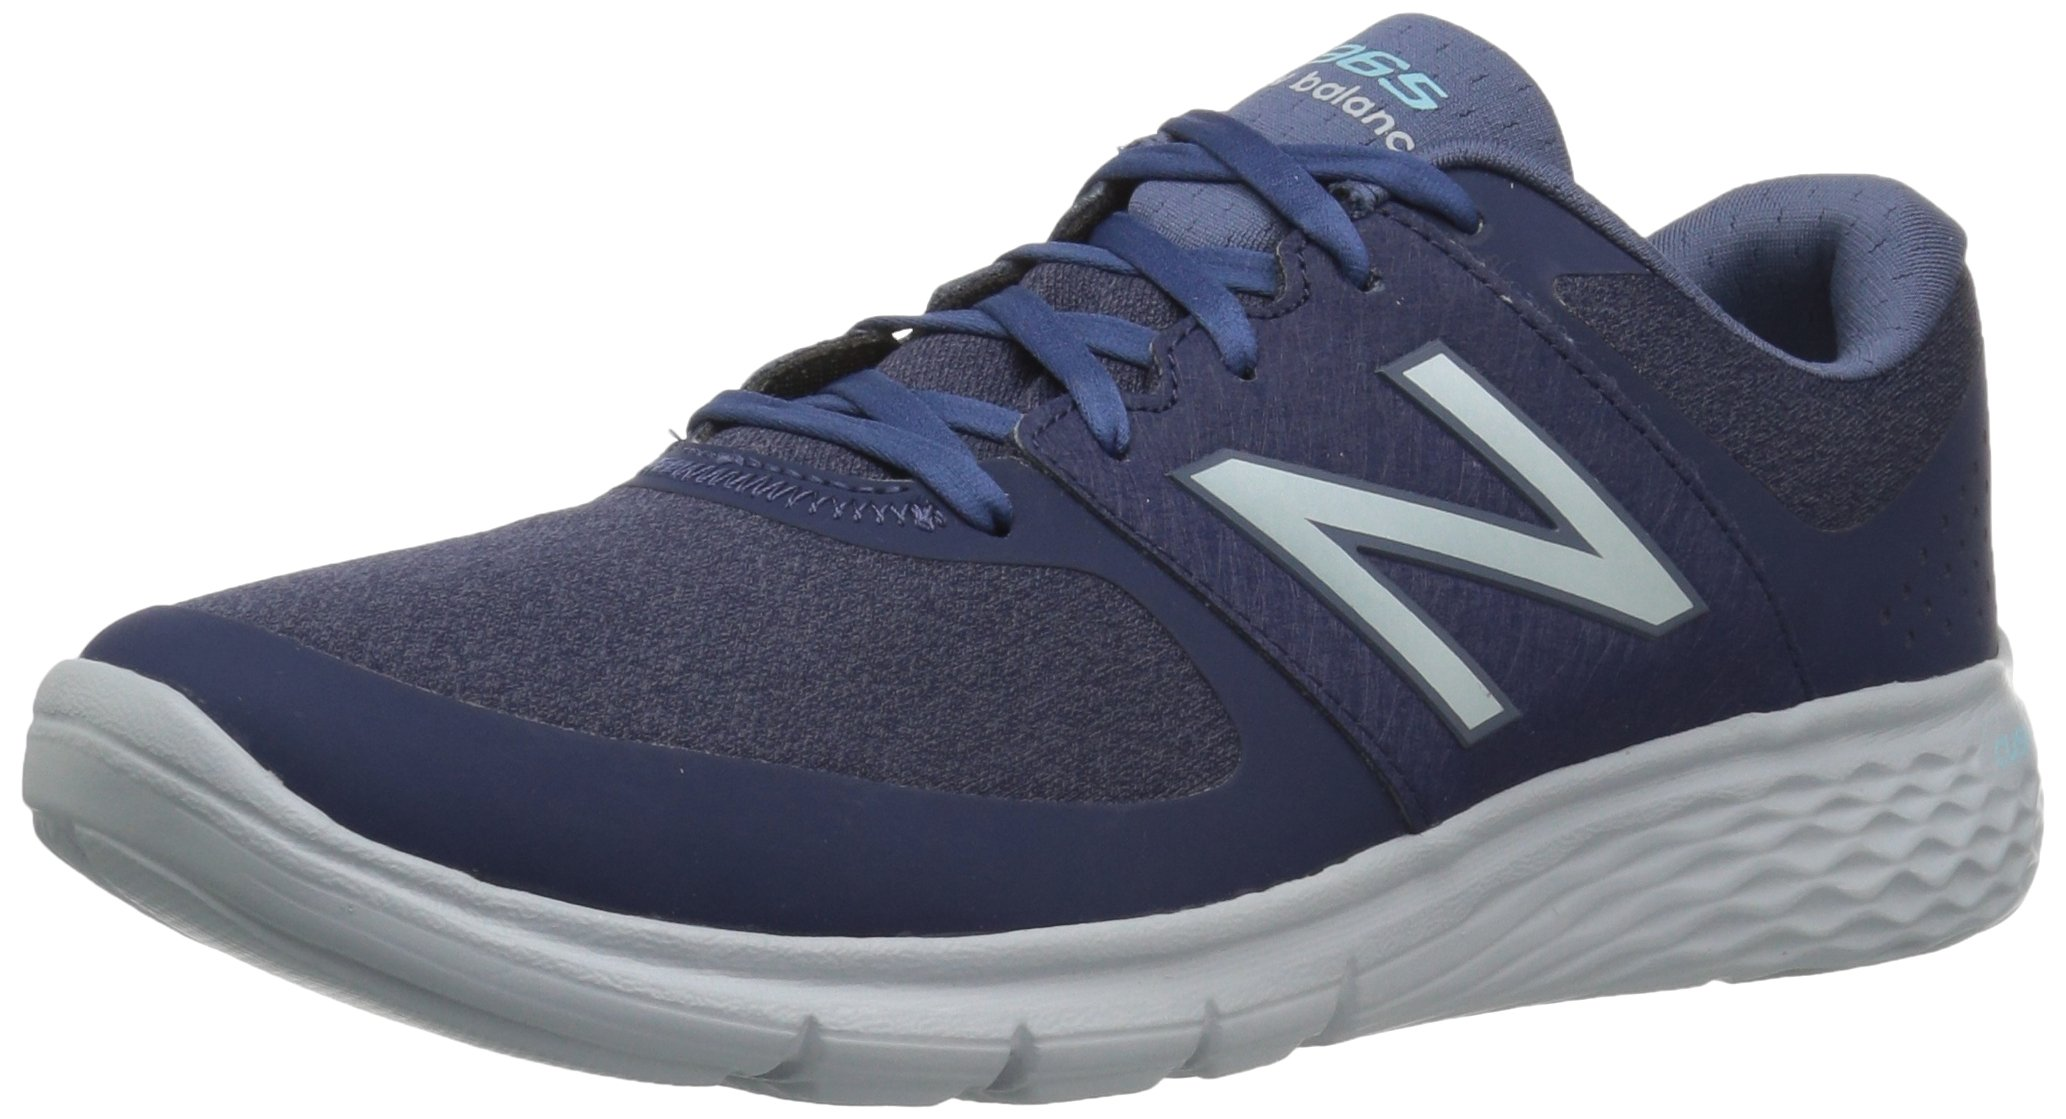 New Balance Women's WA365v1 CUSH + Walking Shoe, Blue/White, 8.5 B US